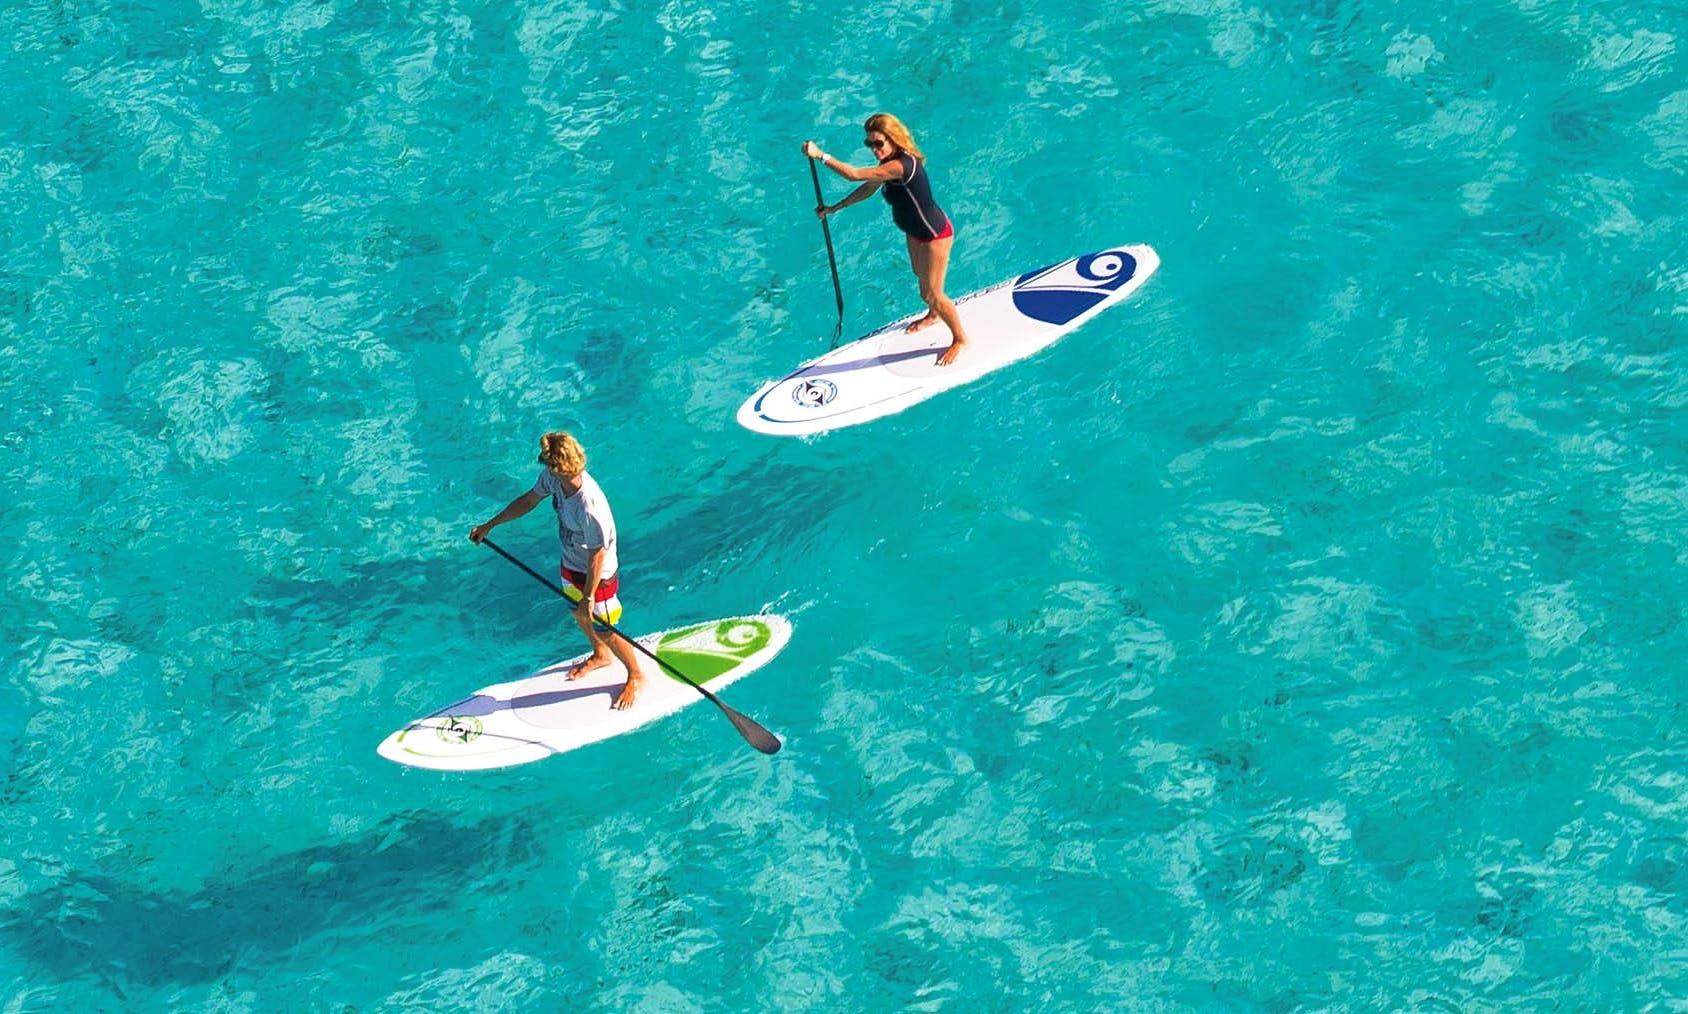 Paddleboard & Surf Rental & Lessons in Loredo, Spain